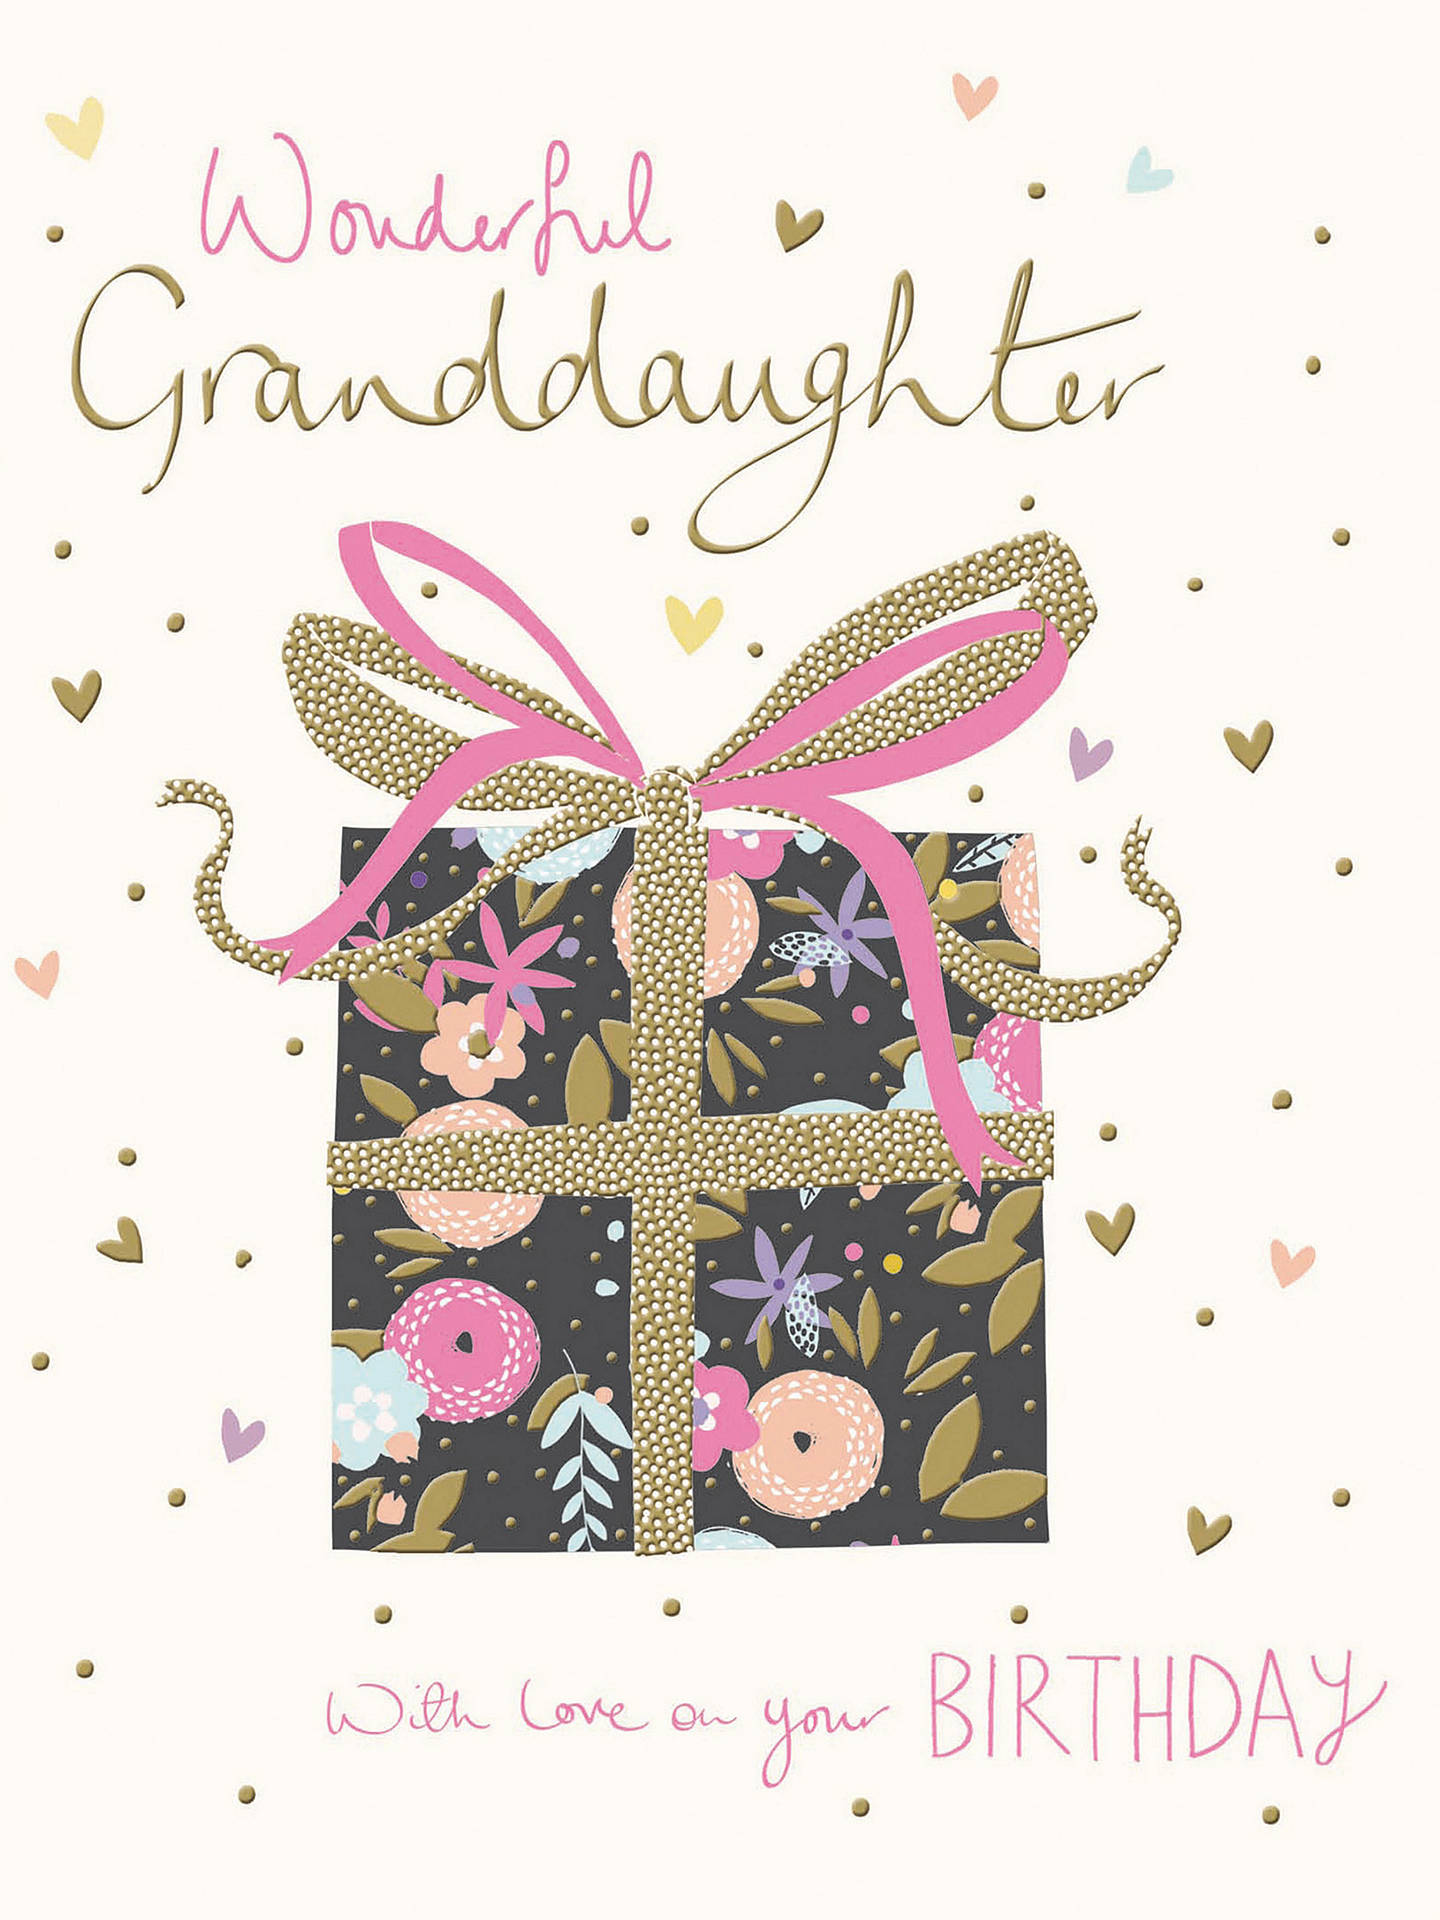 BuyWoodmansterne Wonderful Granddaughter Birthday Card Online At Johnlewis